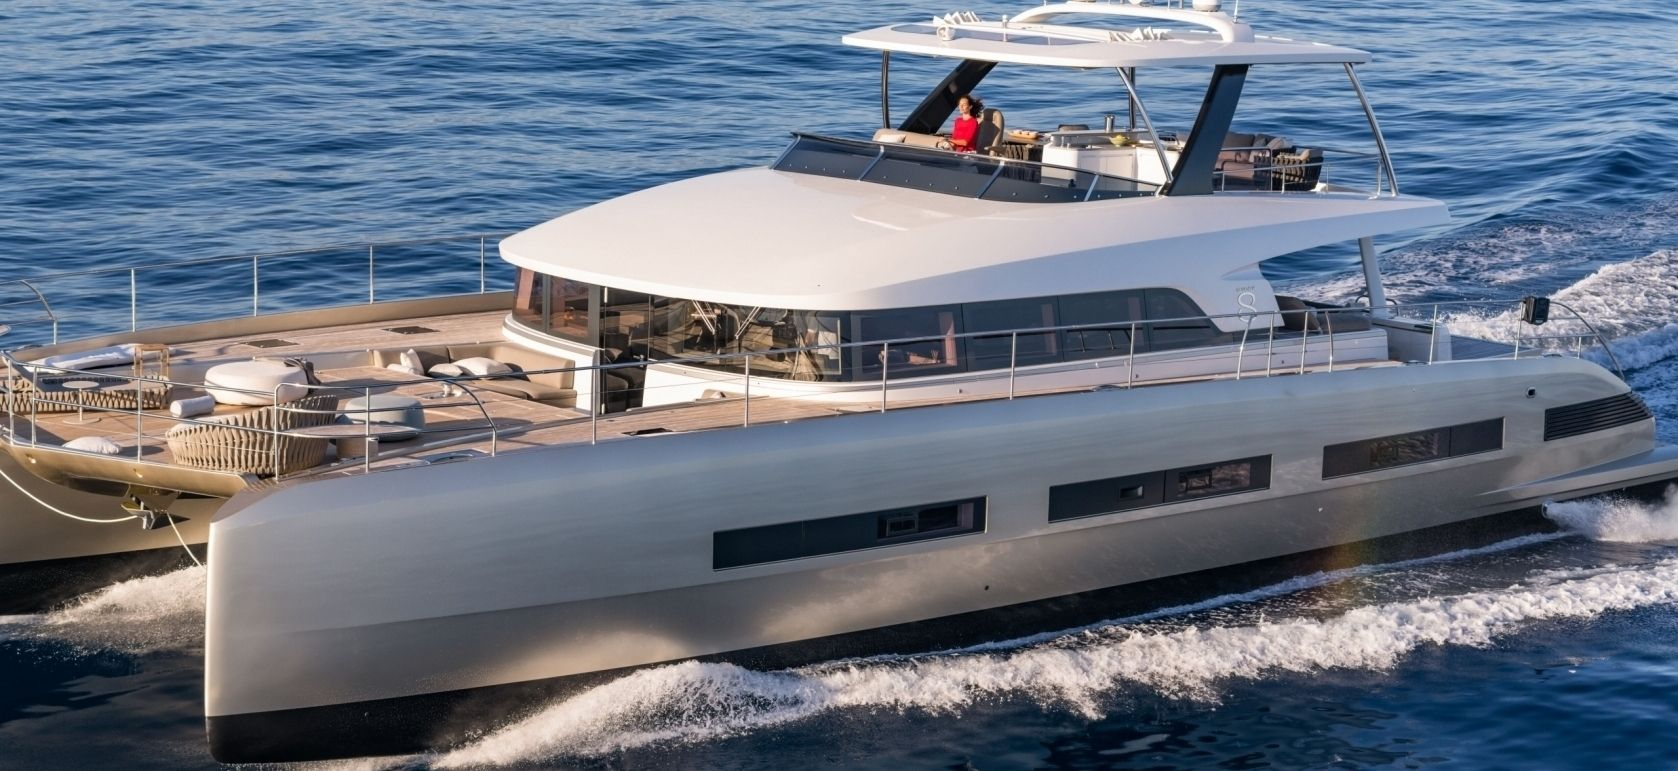 Lagoon Catamaran - Seventy 8 -Yacht for sale